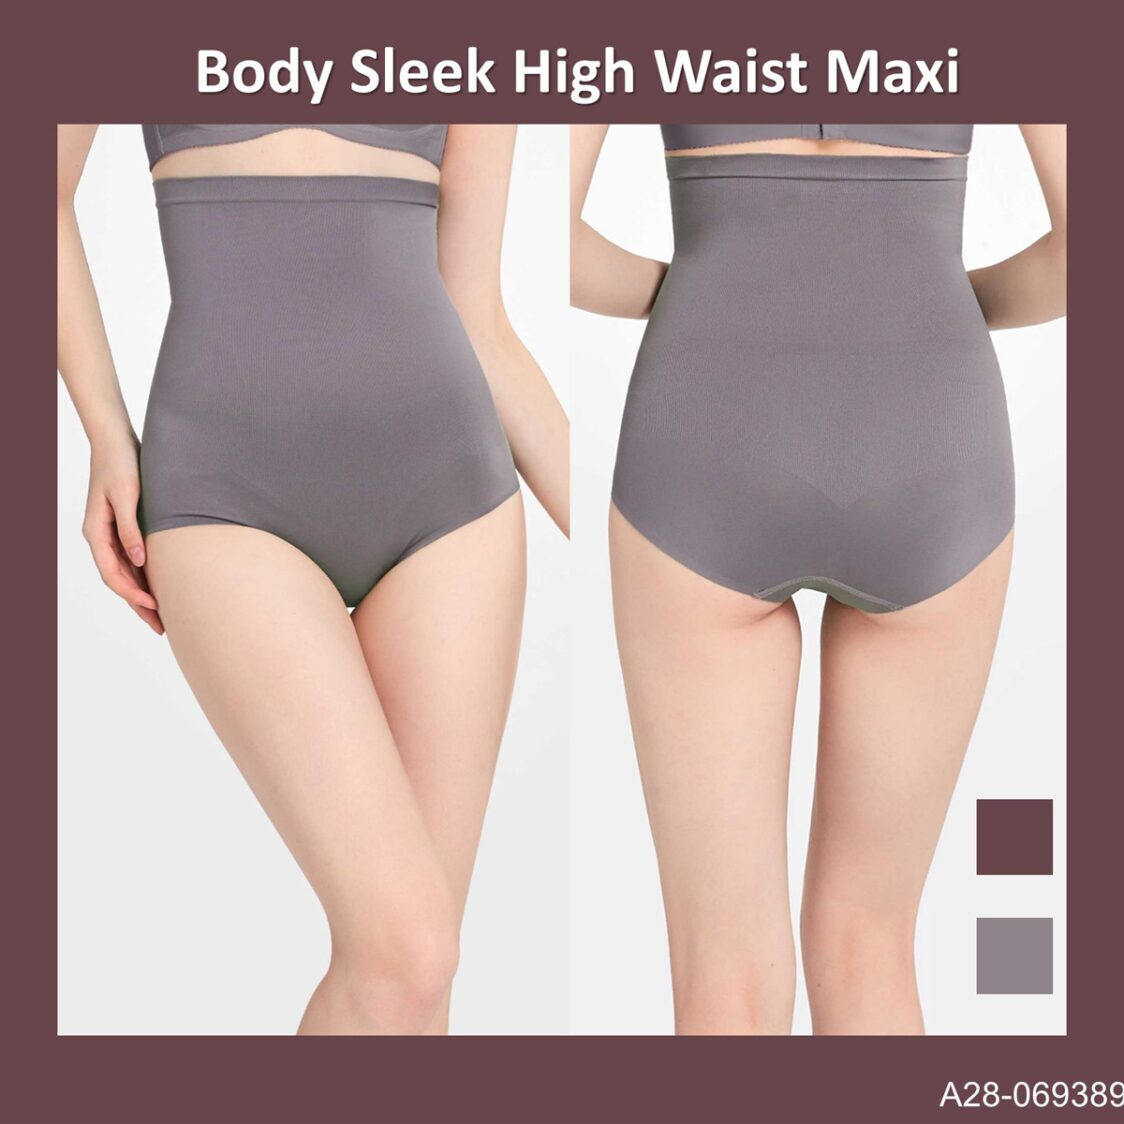 Body Sleek High Waist Maxi A28-069389GRY Grey